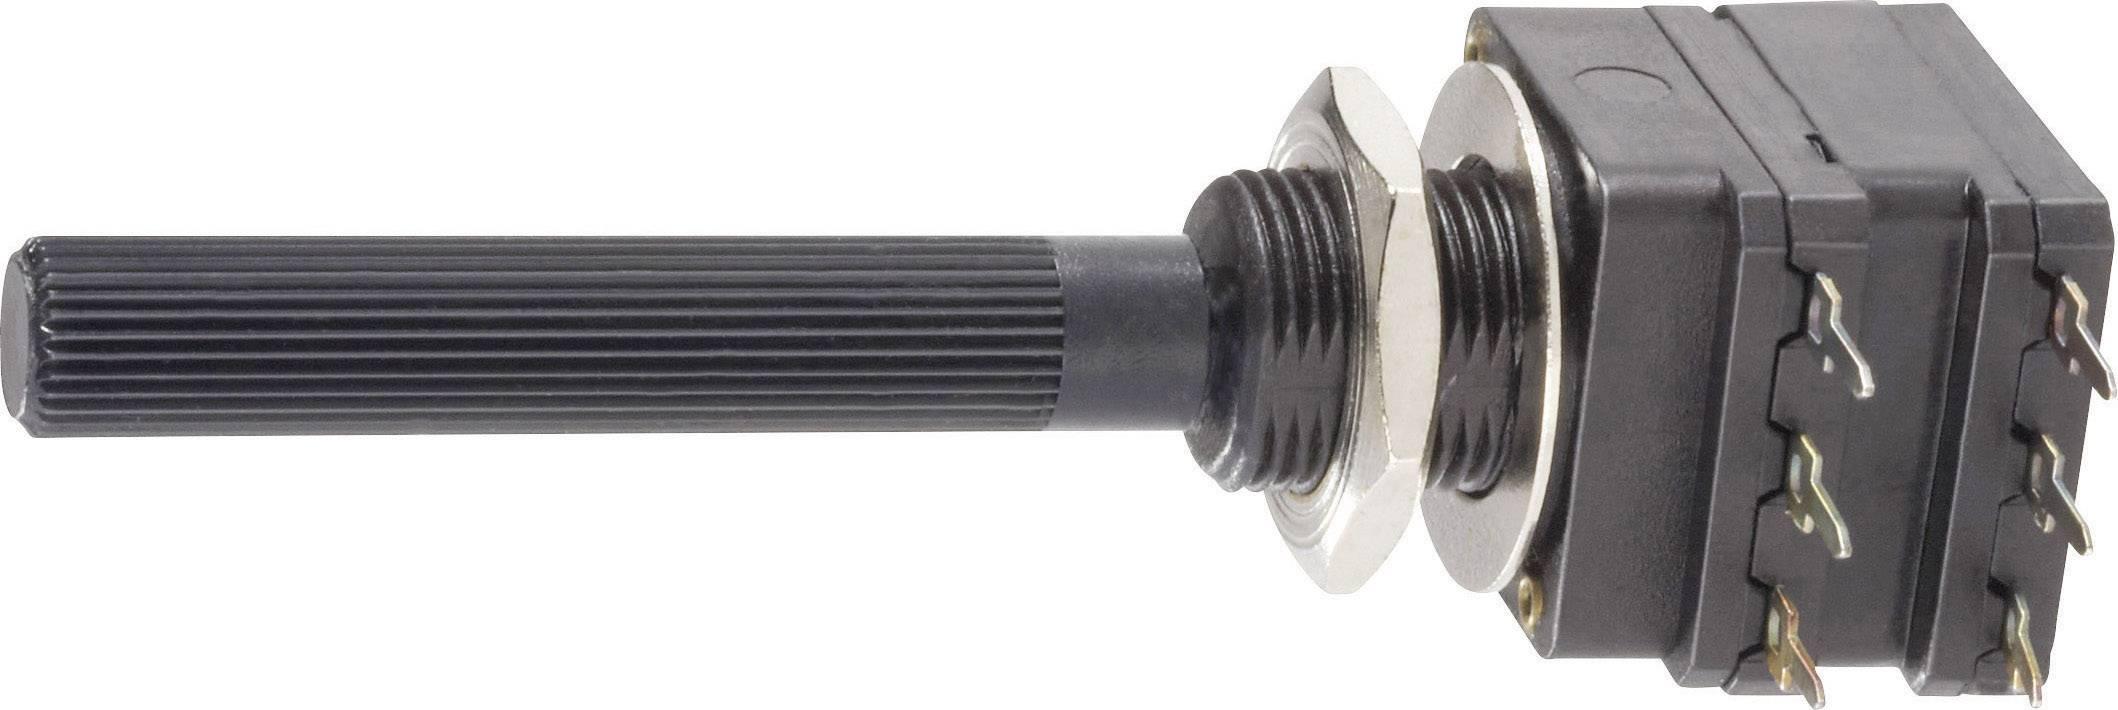 Otočný potenciometer stereo Piher PC16DH-10IP06104B2020MTA PC16DH-10IP06104B2020MTA, 0.1 W, 100 kOhm, 1 ks